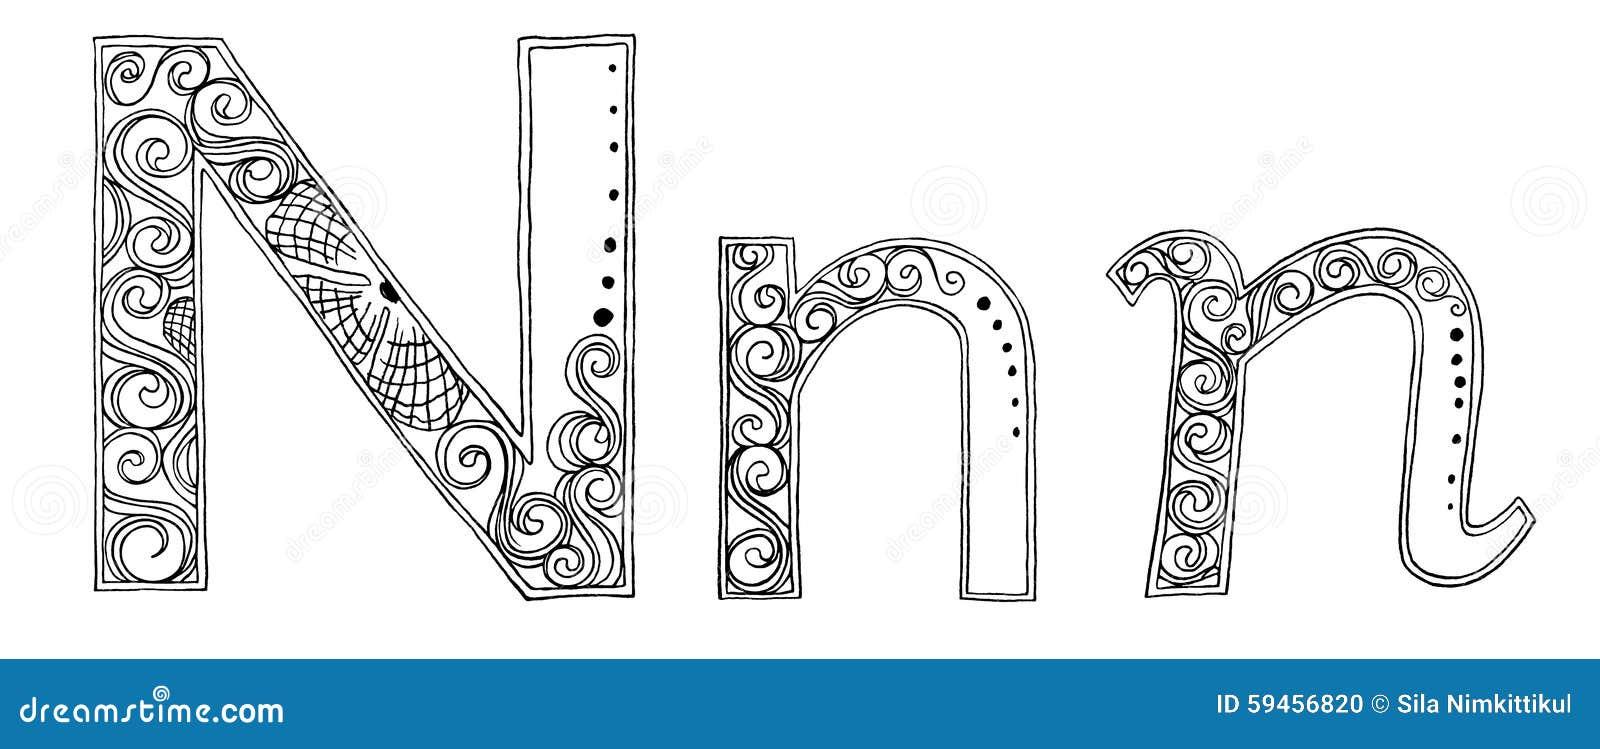 N Vanda Freehand Pencil Sketch Font Stock Illustration